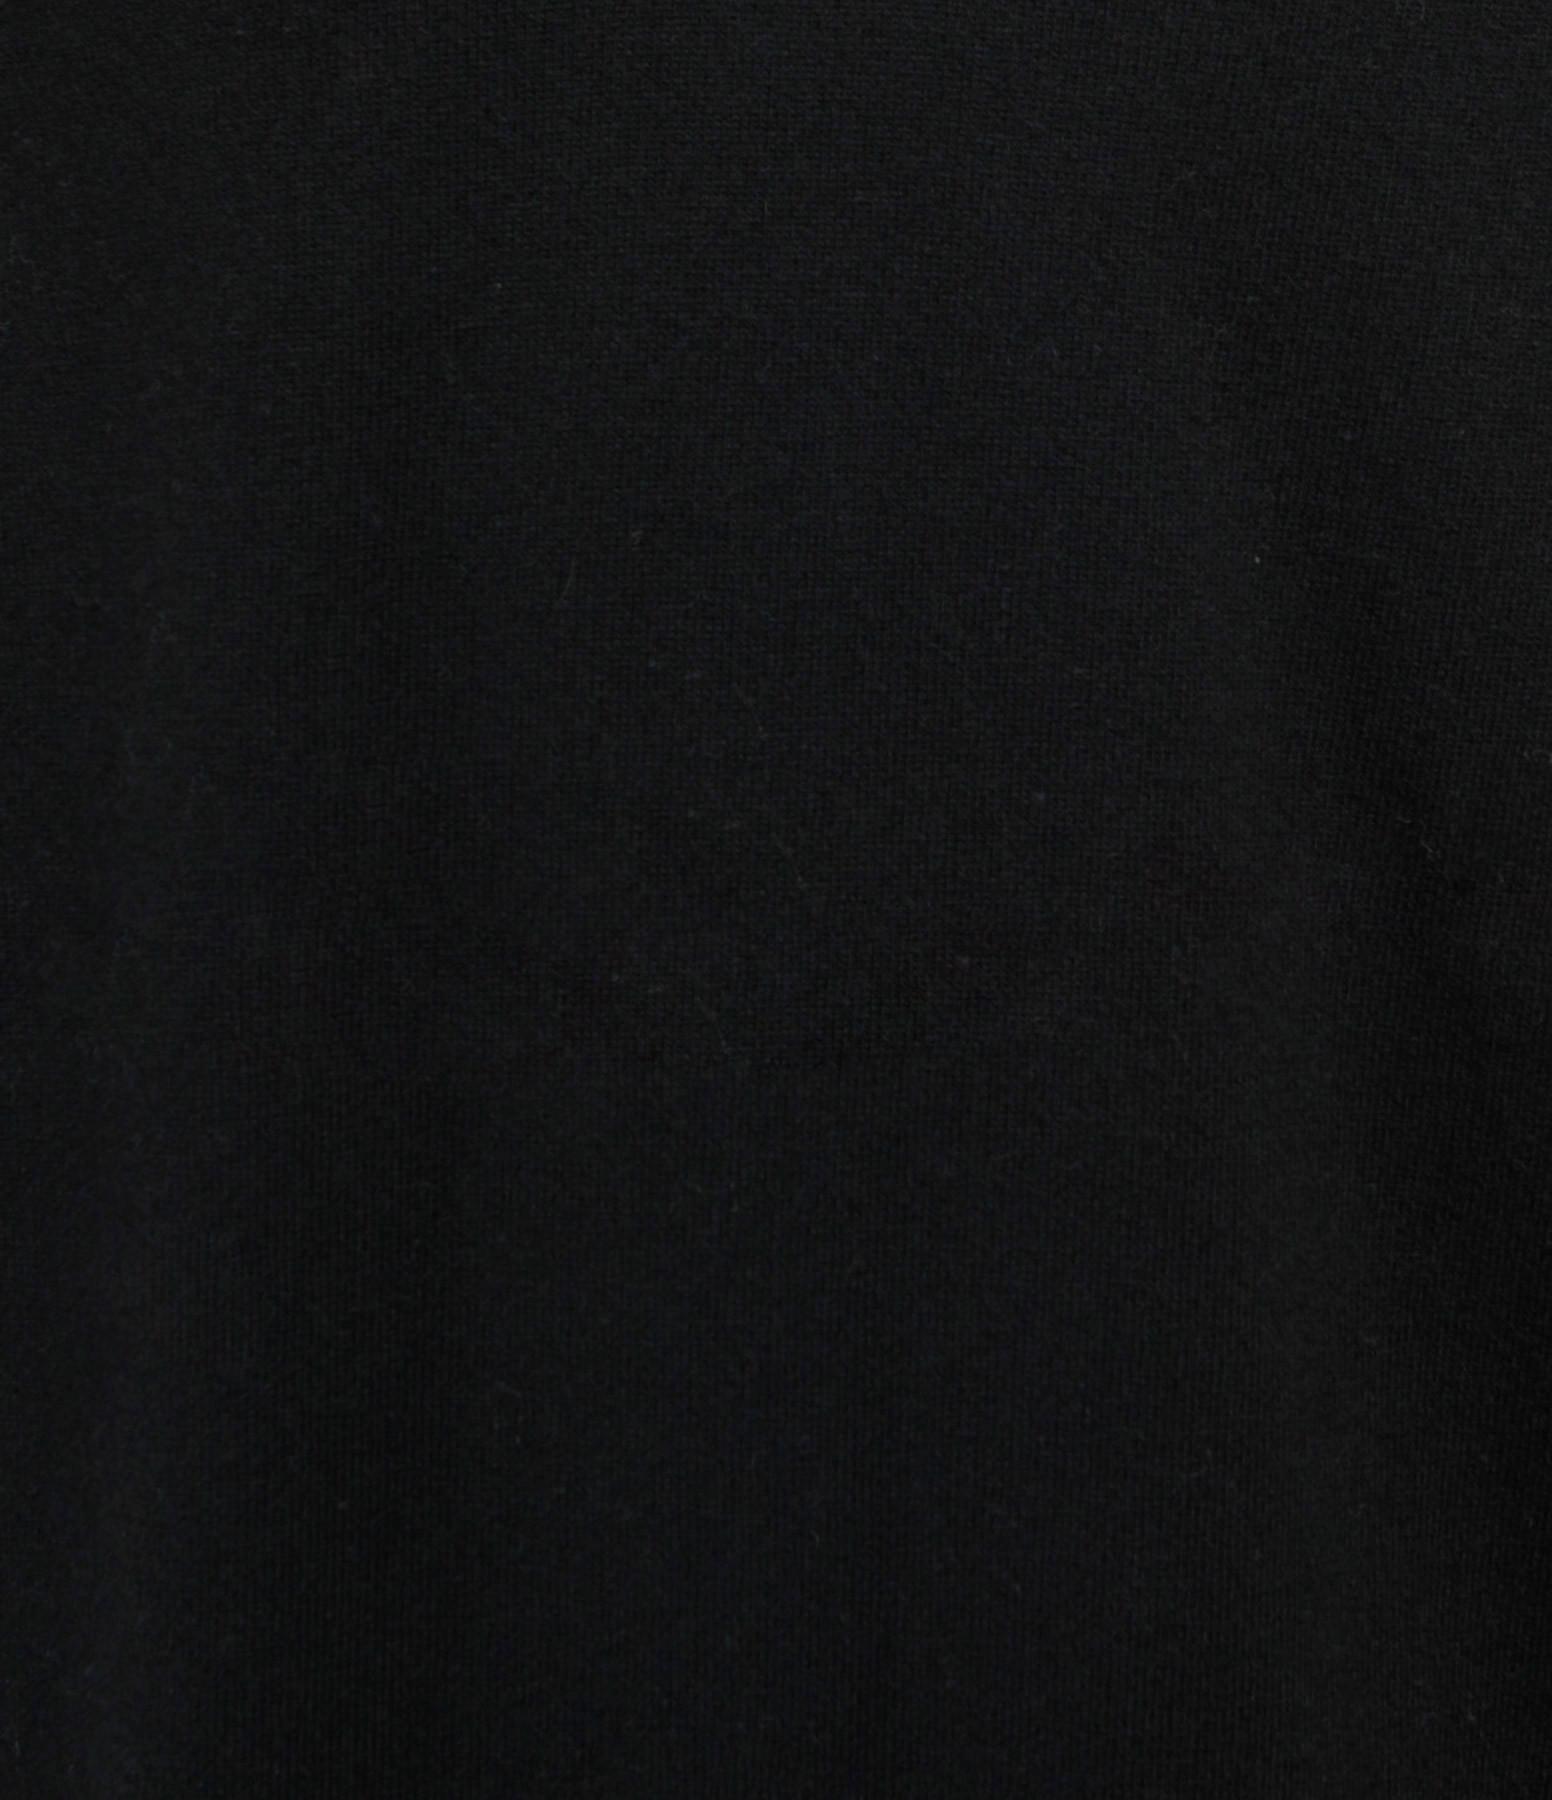 MAEVY CONCEPT - Robe Absolu Cachemire Laine Noir